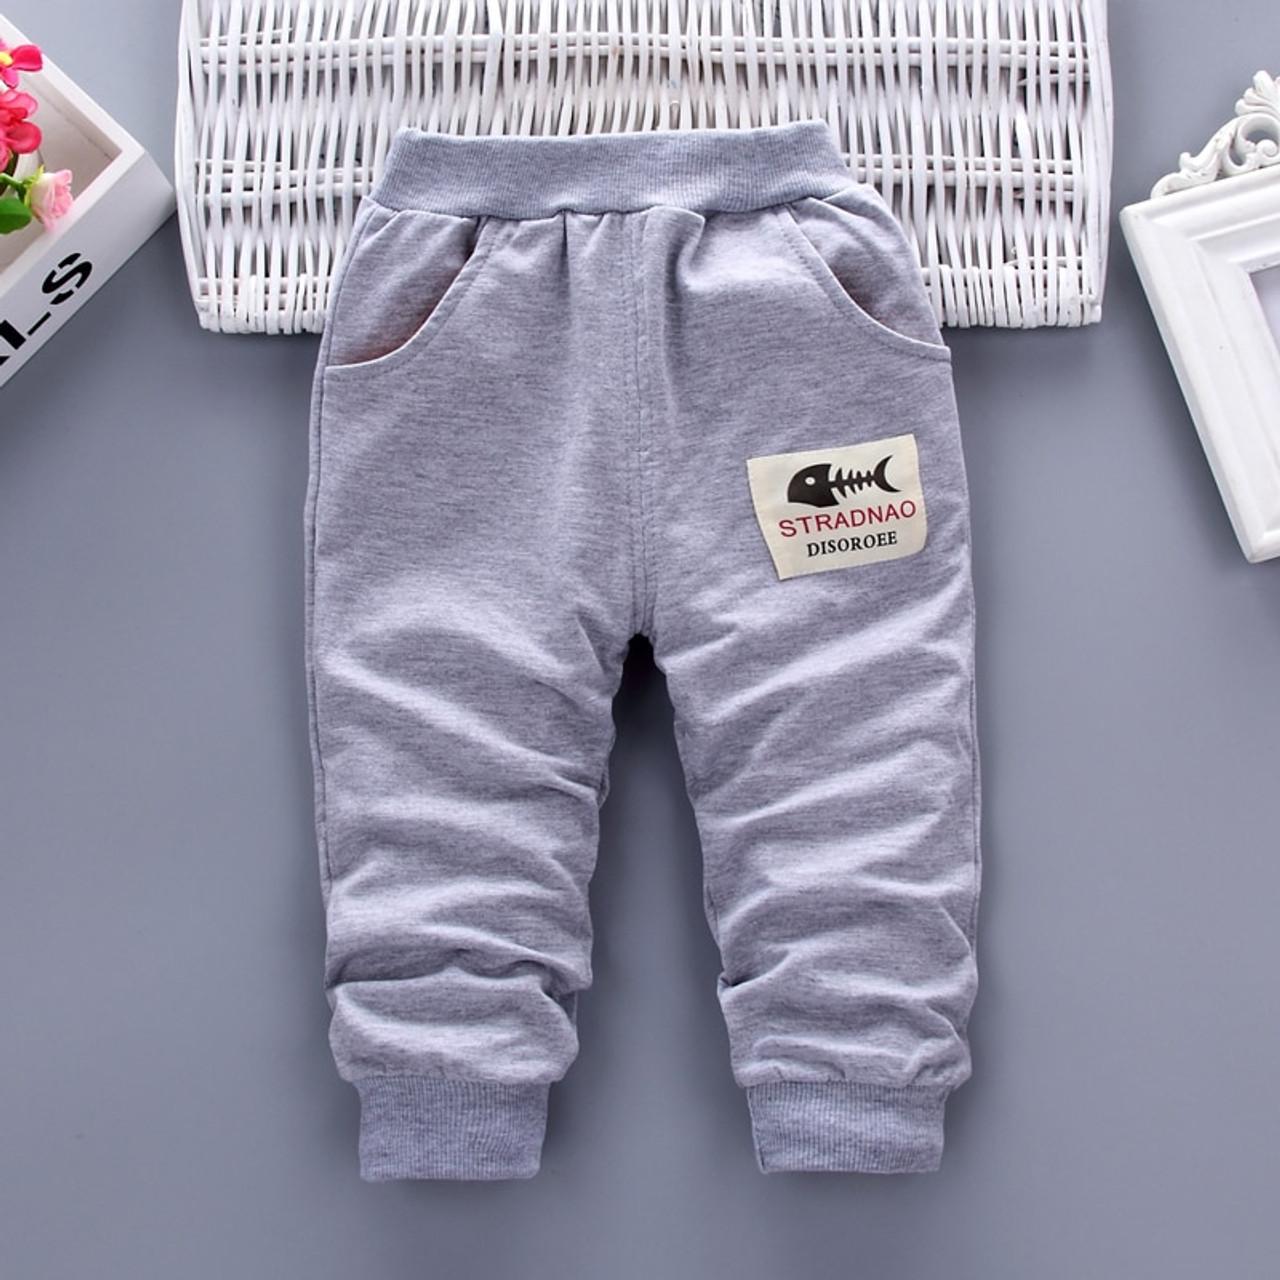 d0b860f34 ... 2017 New Autumn Baby Girls Boys Minion Suits Infant/Newborn Clothes  Sets Kids Coat+ ...